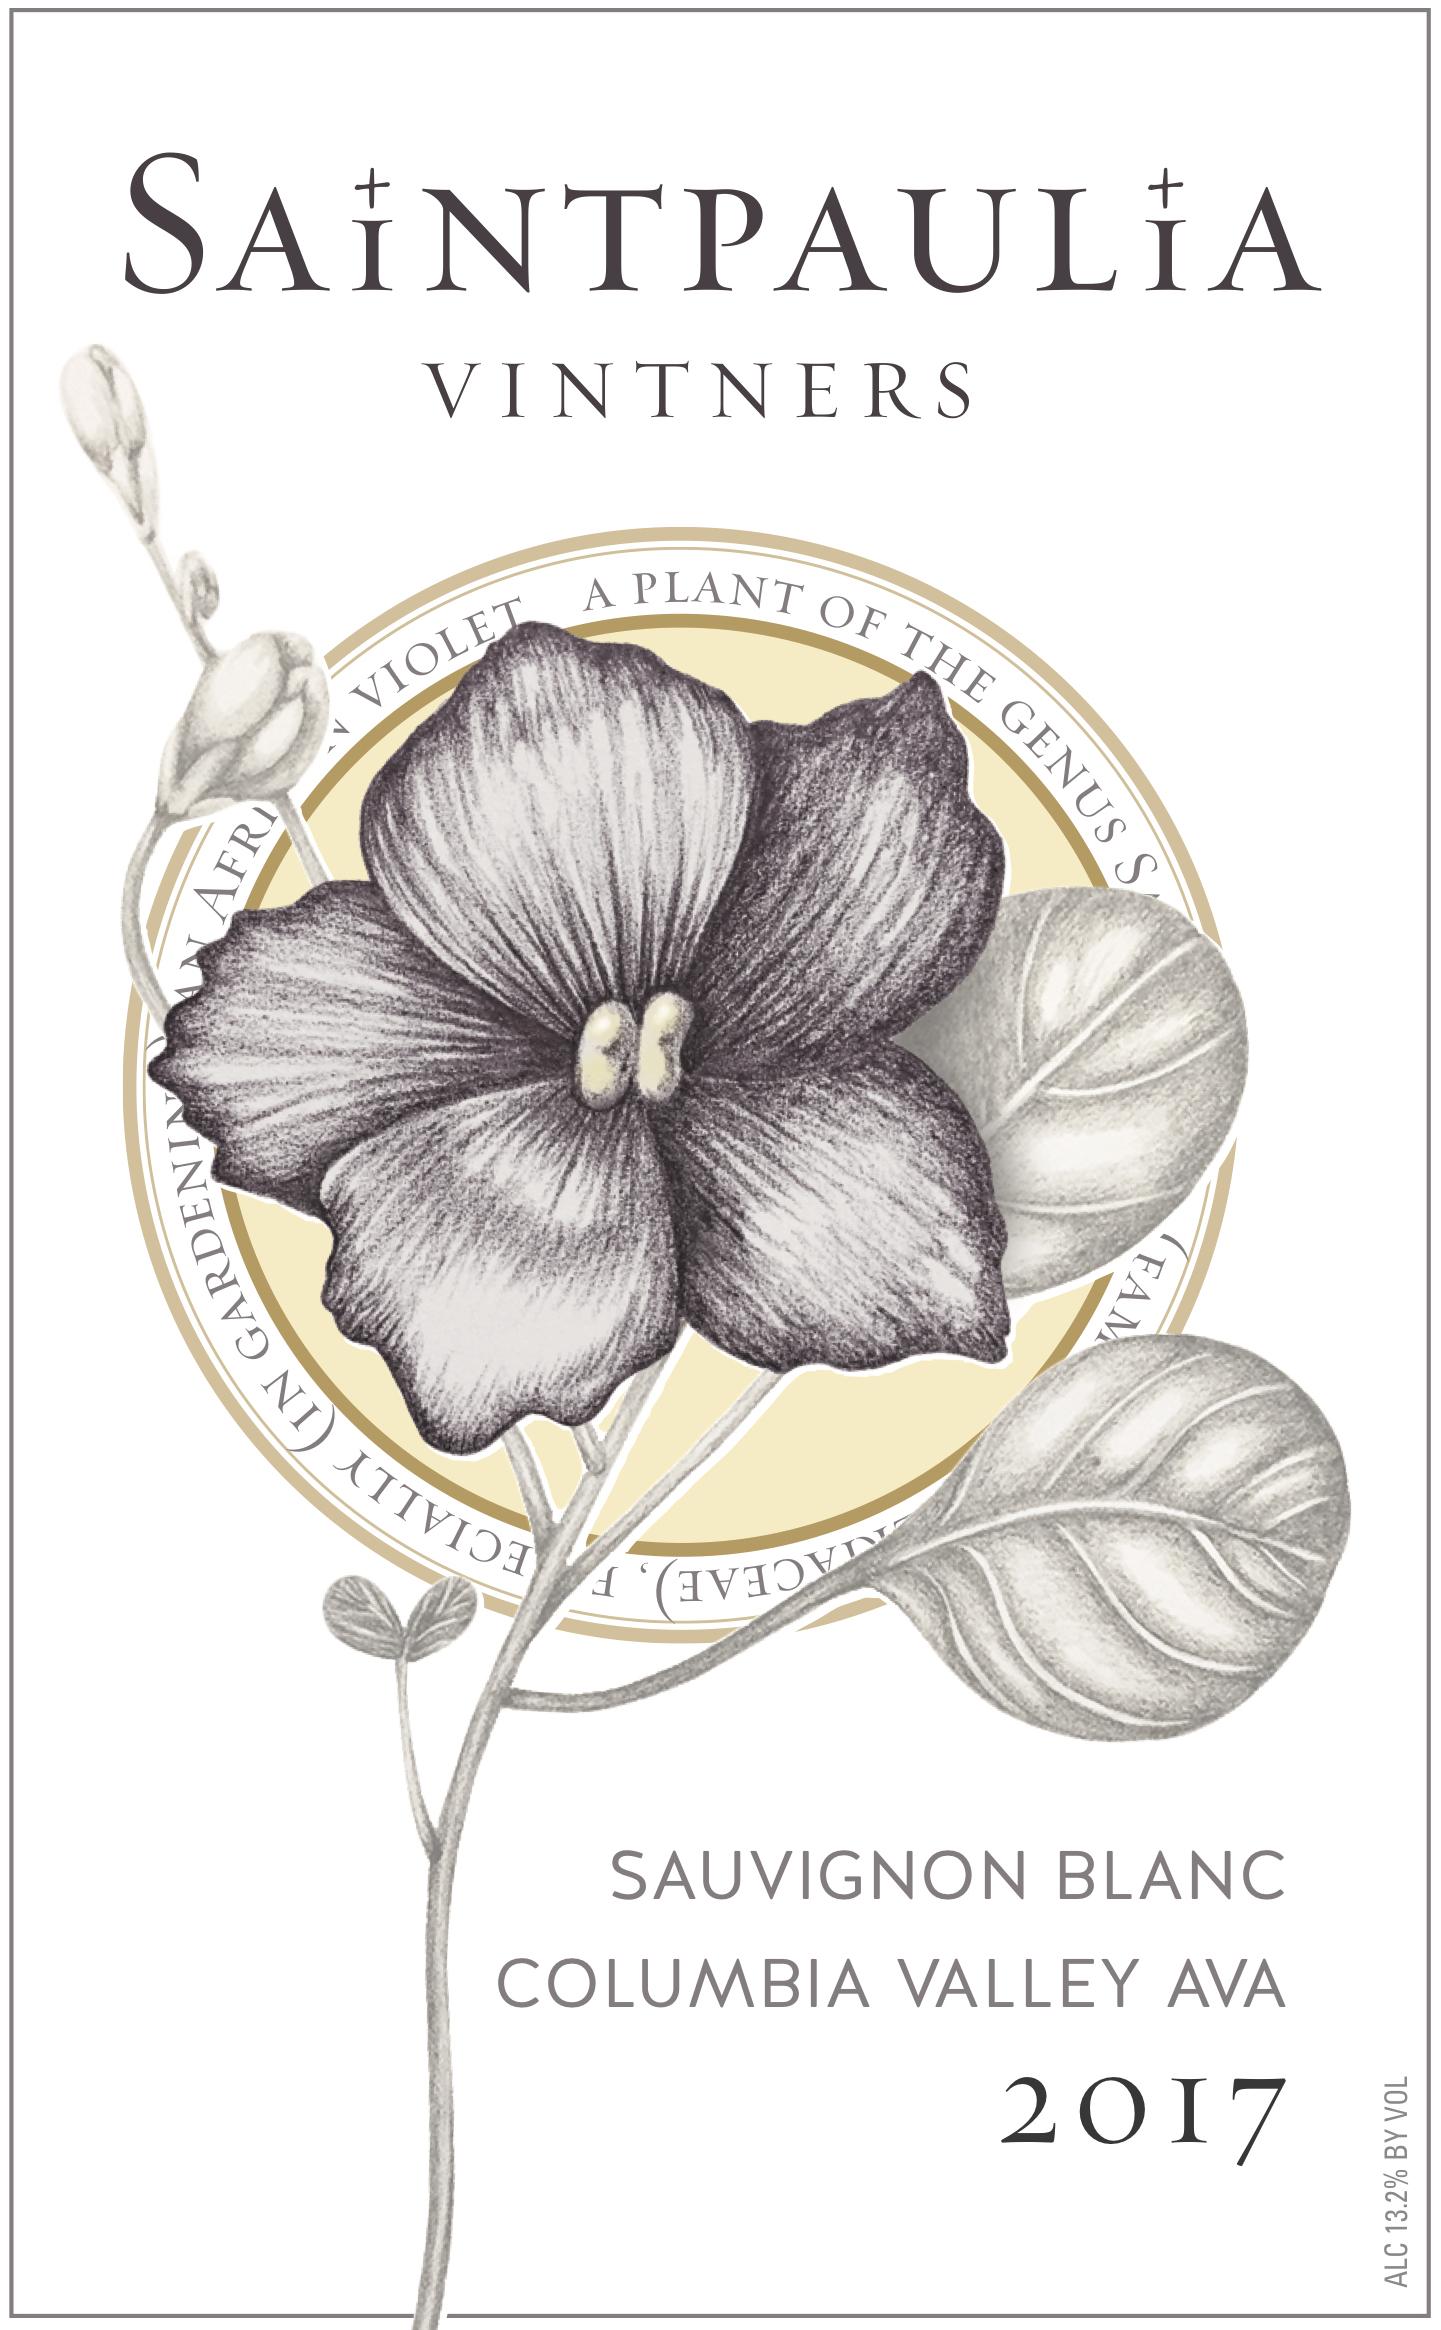 NEW! – 2017 Sauvignon Blanc